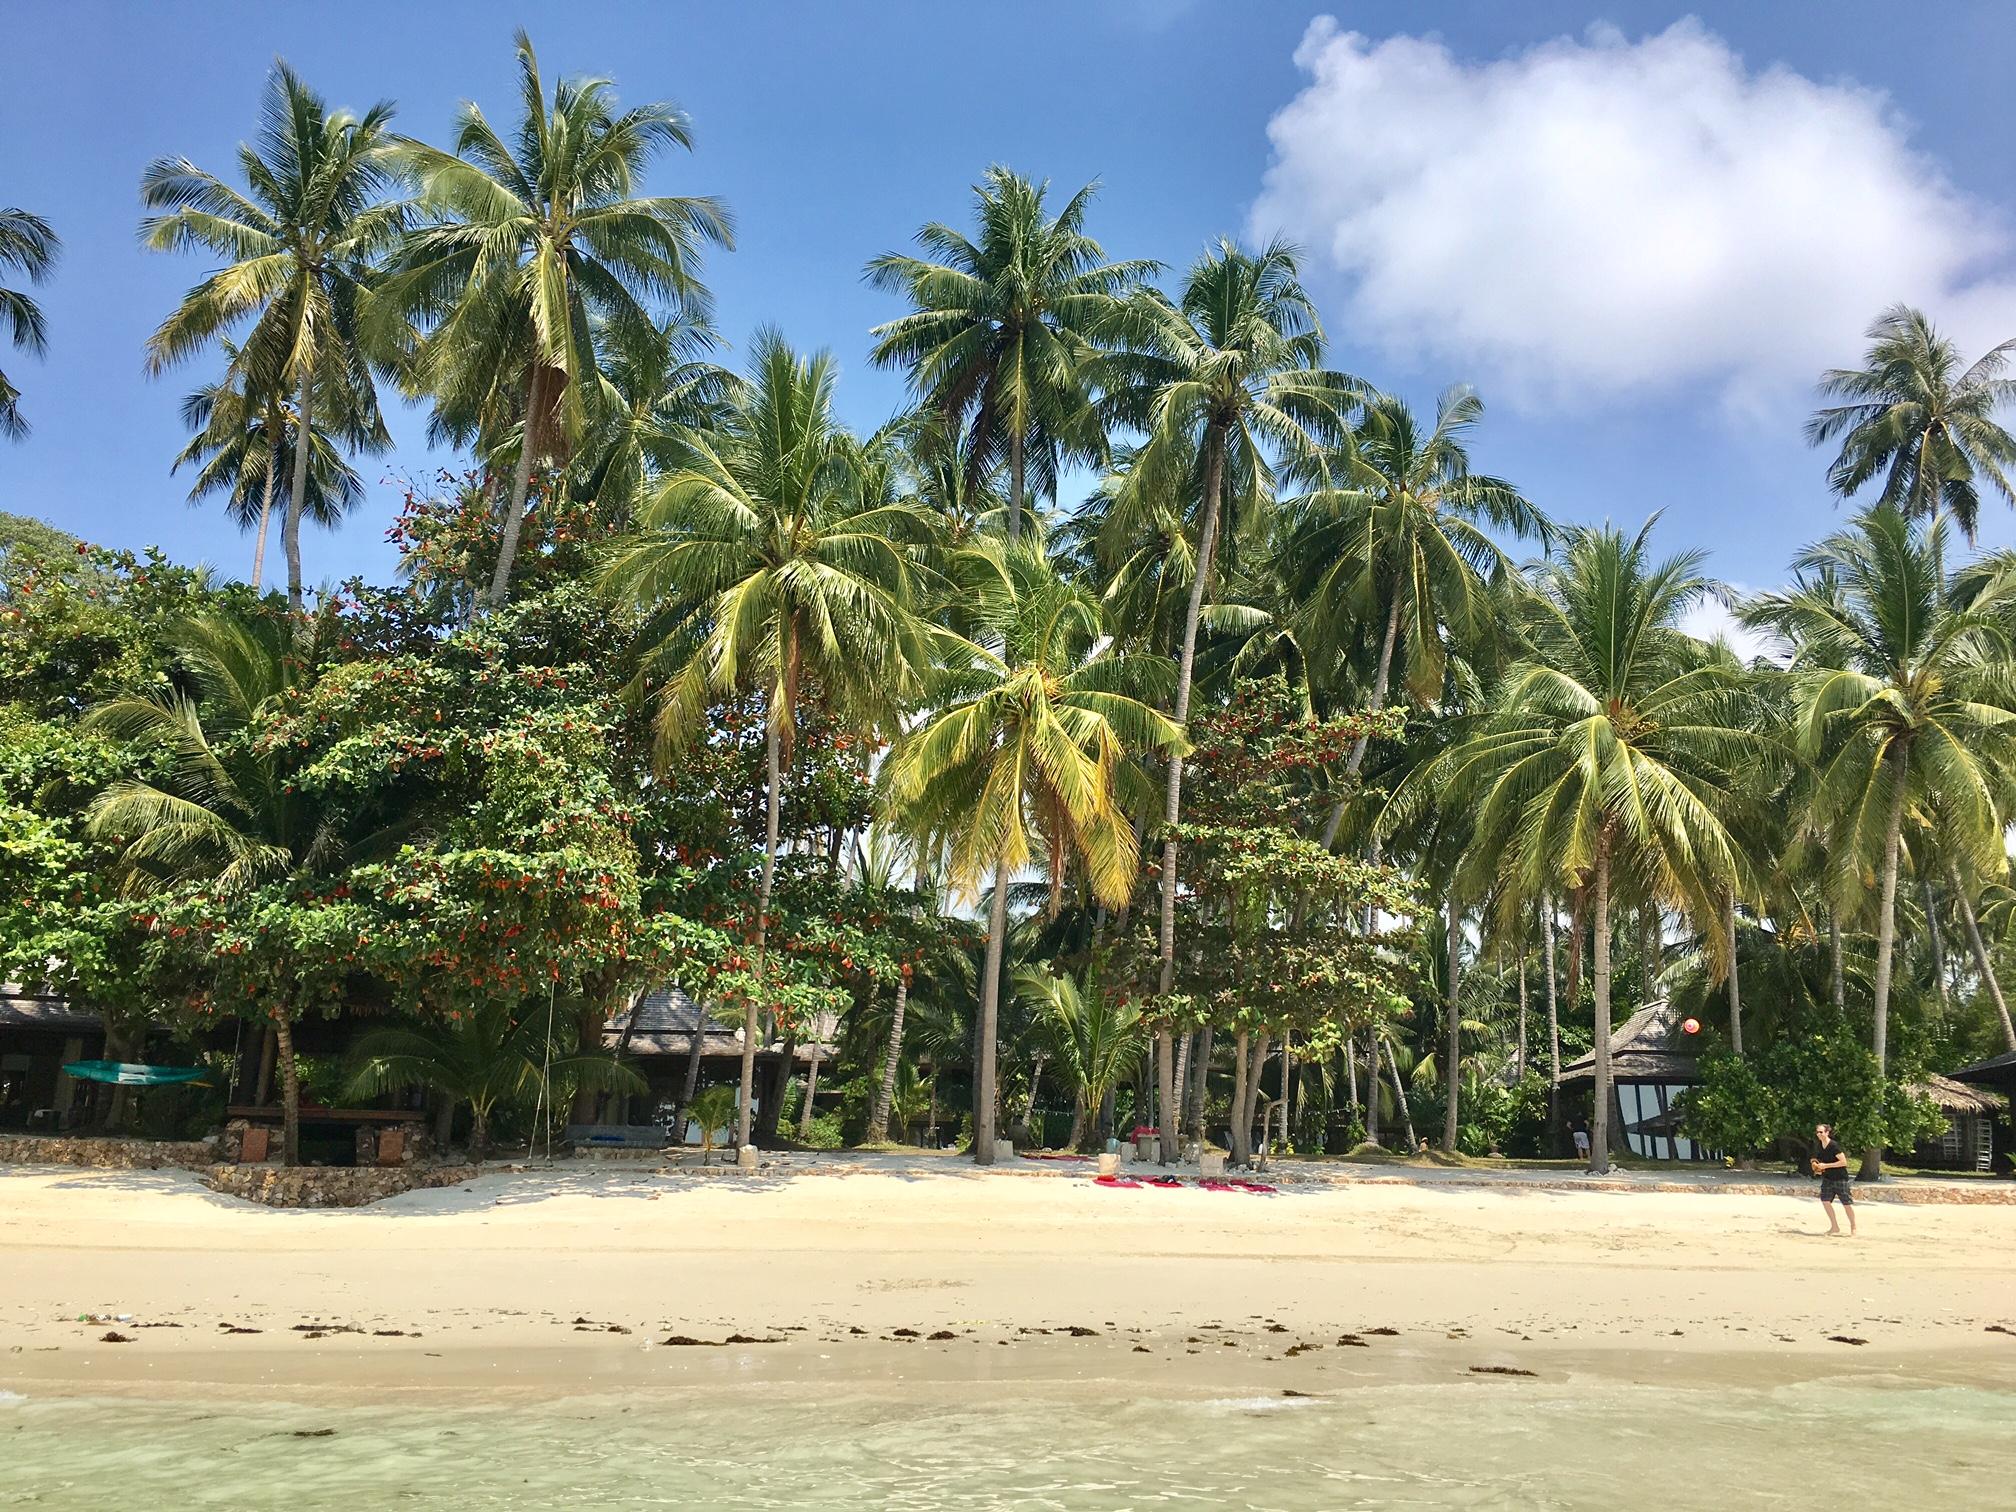 Strand auf Koh Samui, Bild Dr. Alexa Iwan